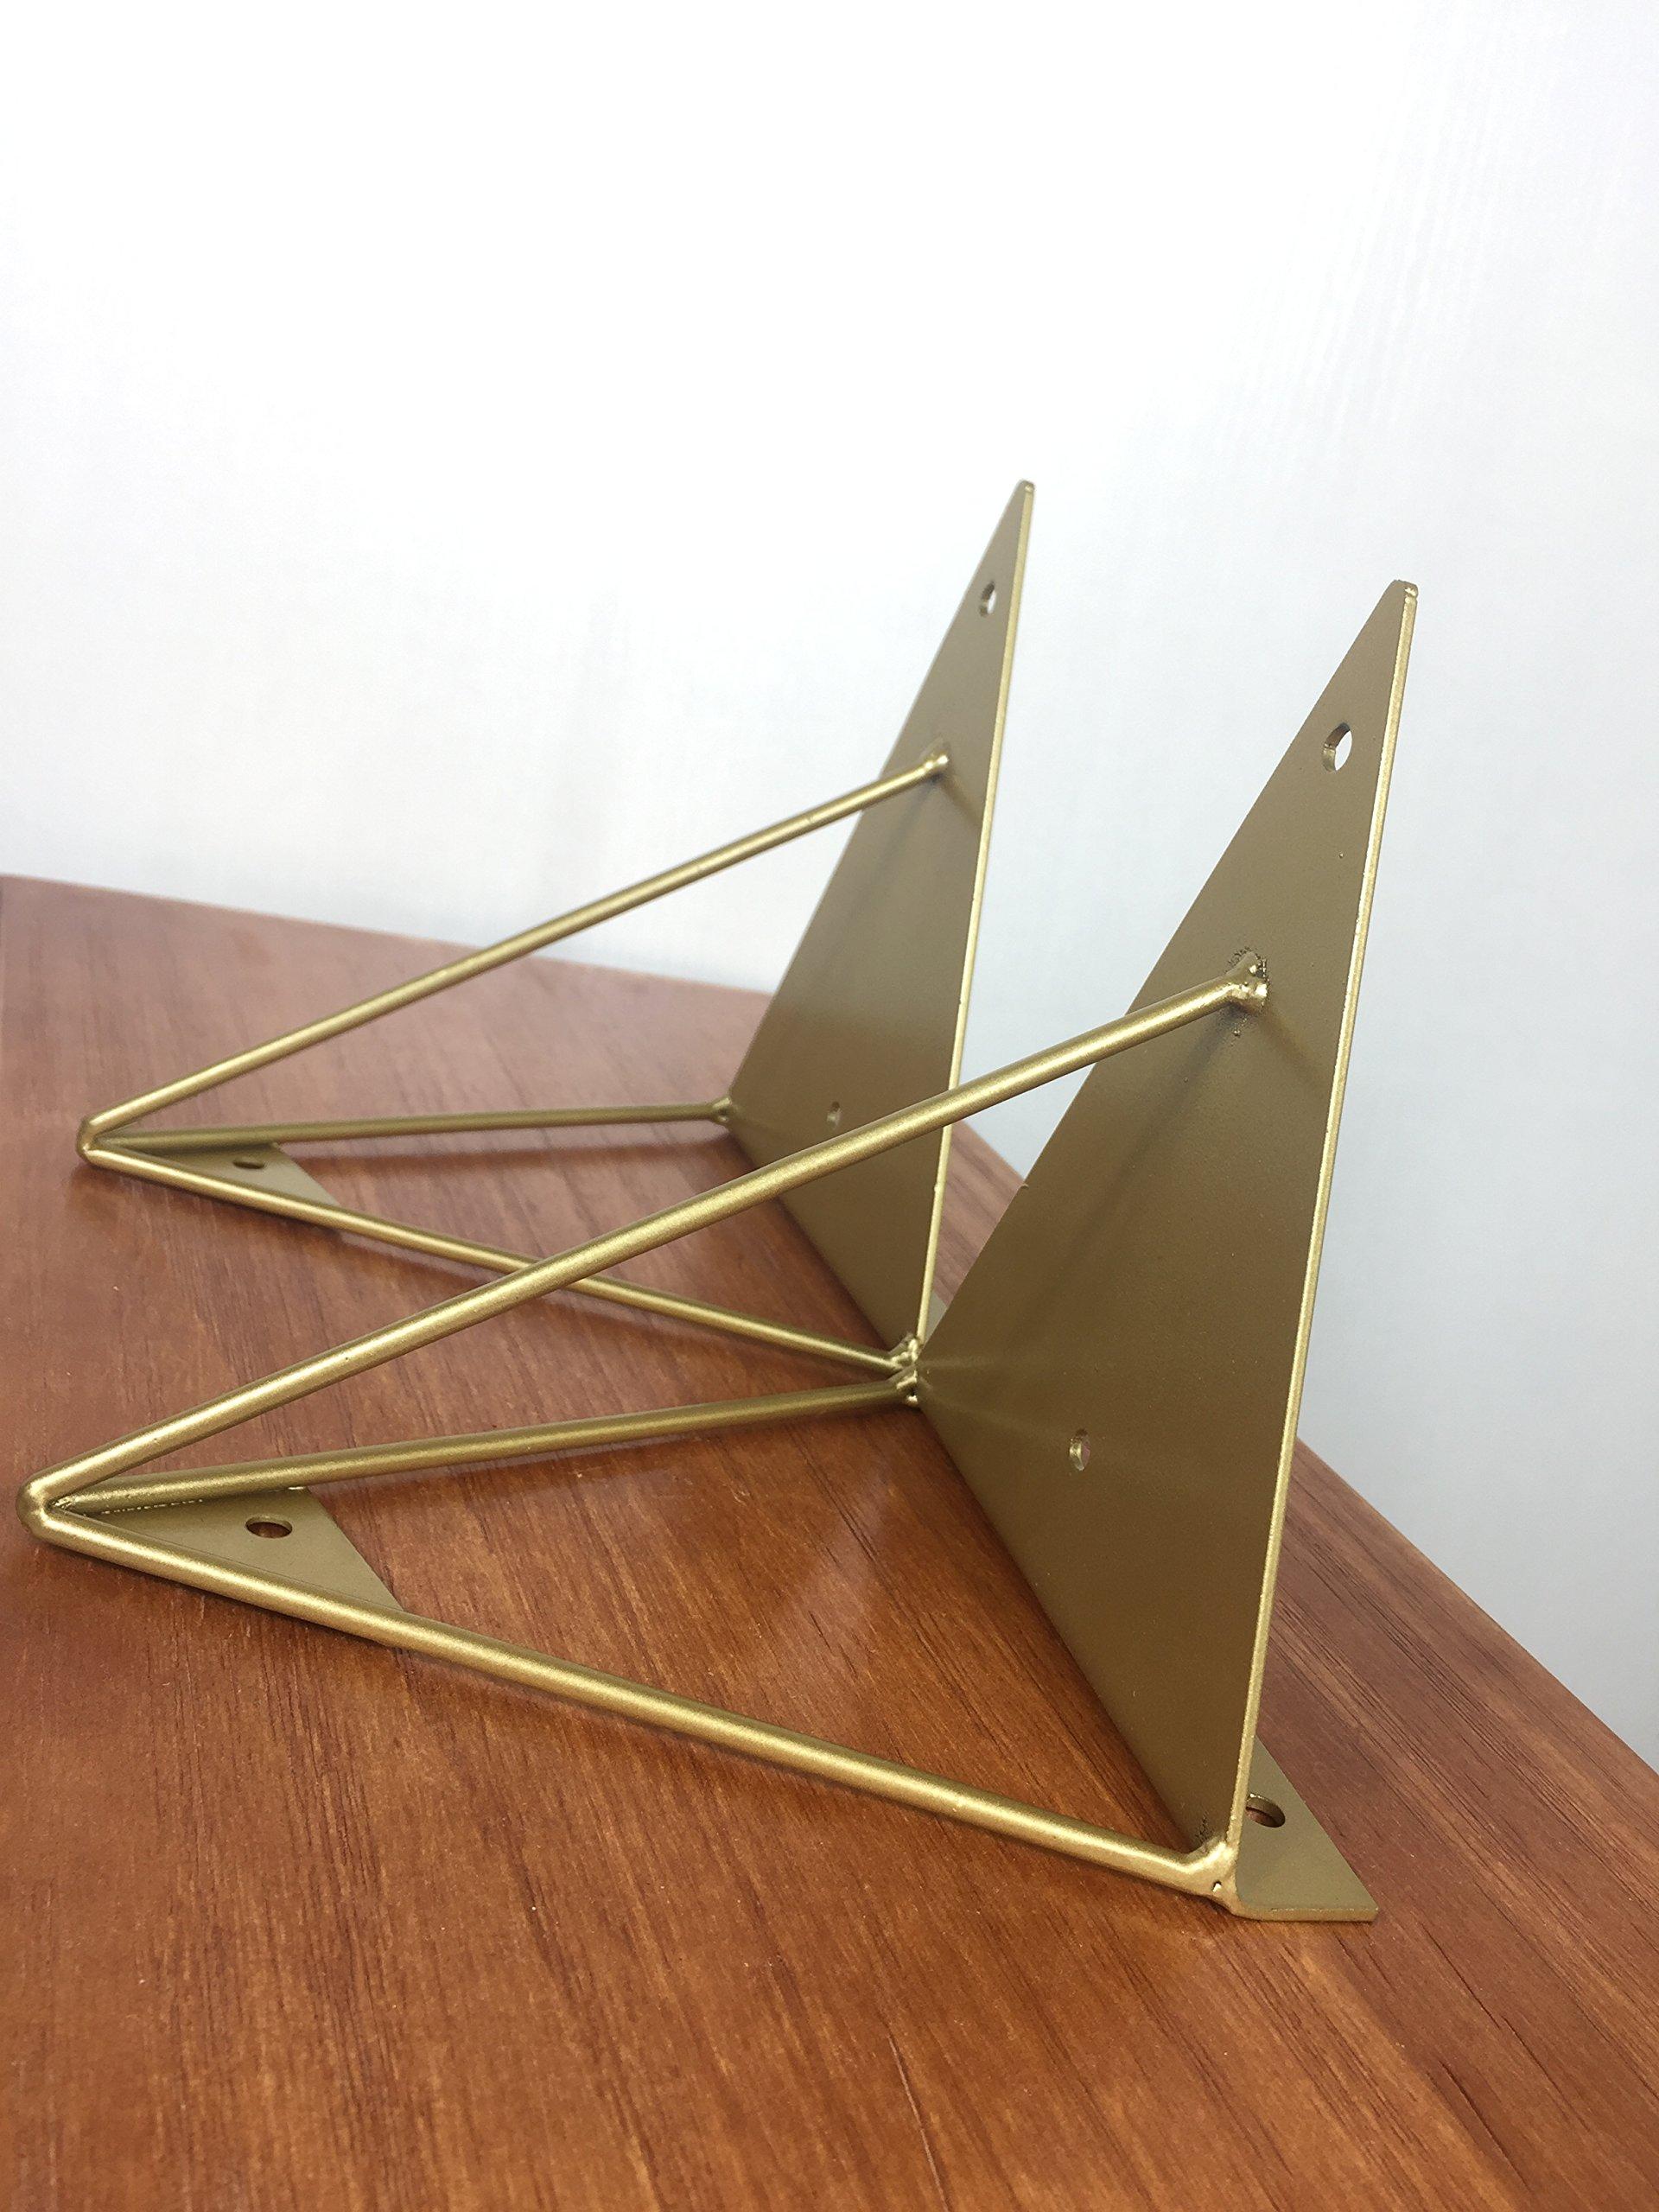 WGX Shelf Brackets,Wall/Display Shelf Hung Bracket DIY Shelf (Gold) 2pcs-Pack